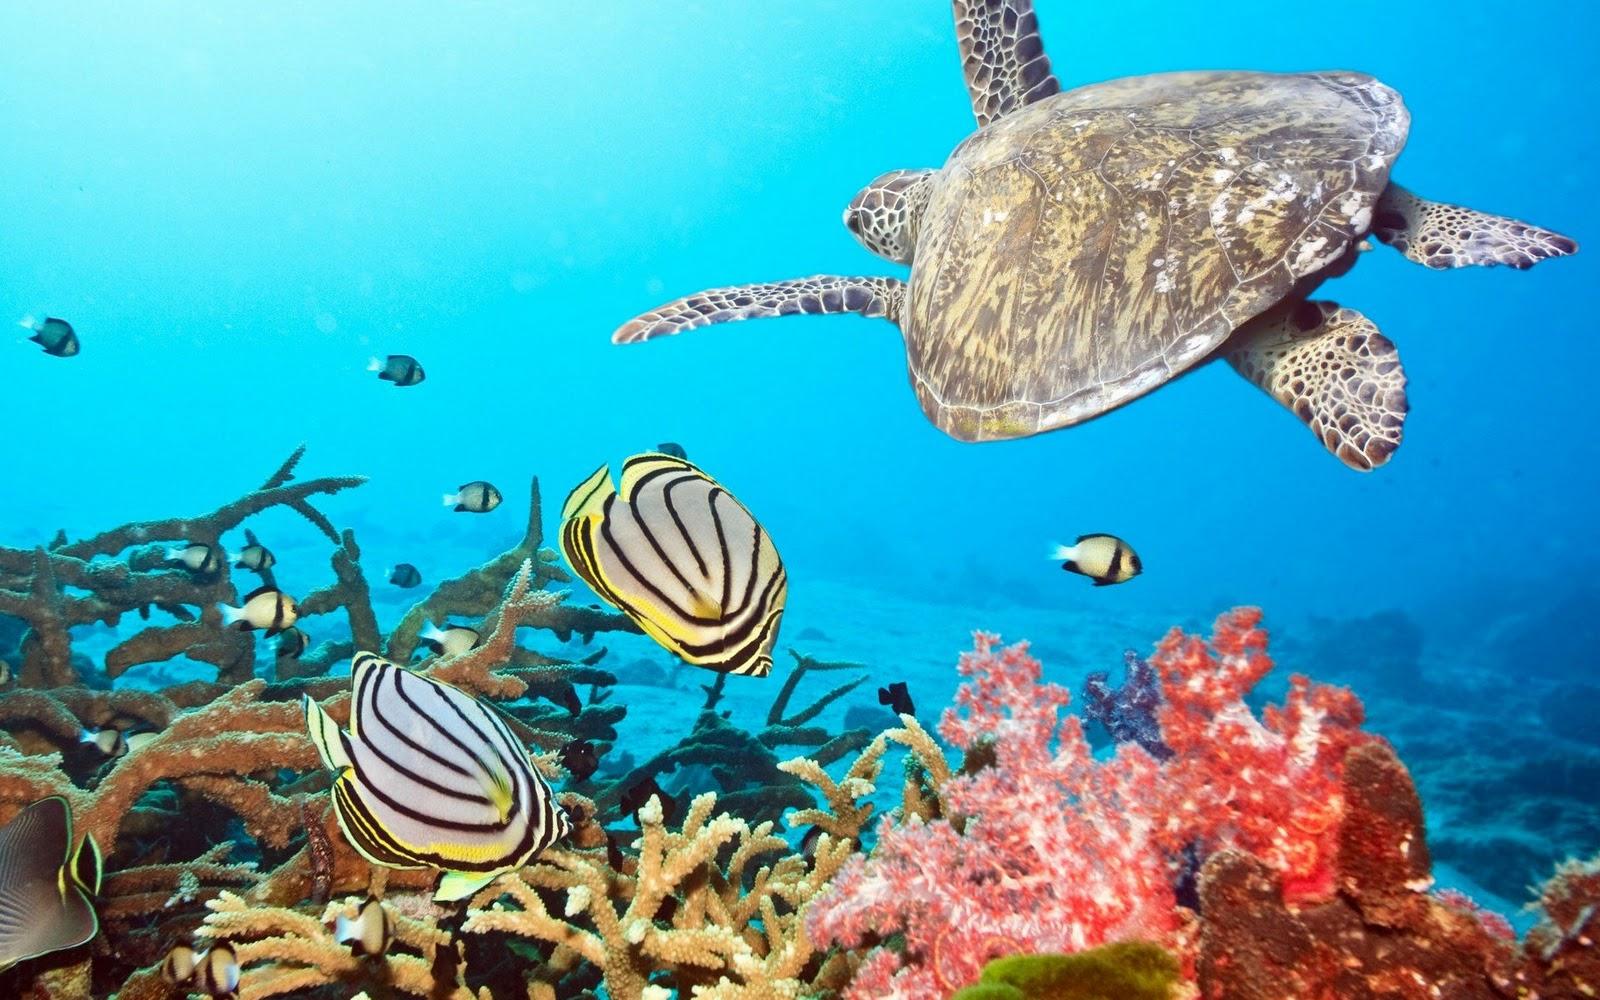 Ocean Plants Fish Underwater Wallpaper Screensaver Image Source From This